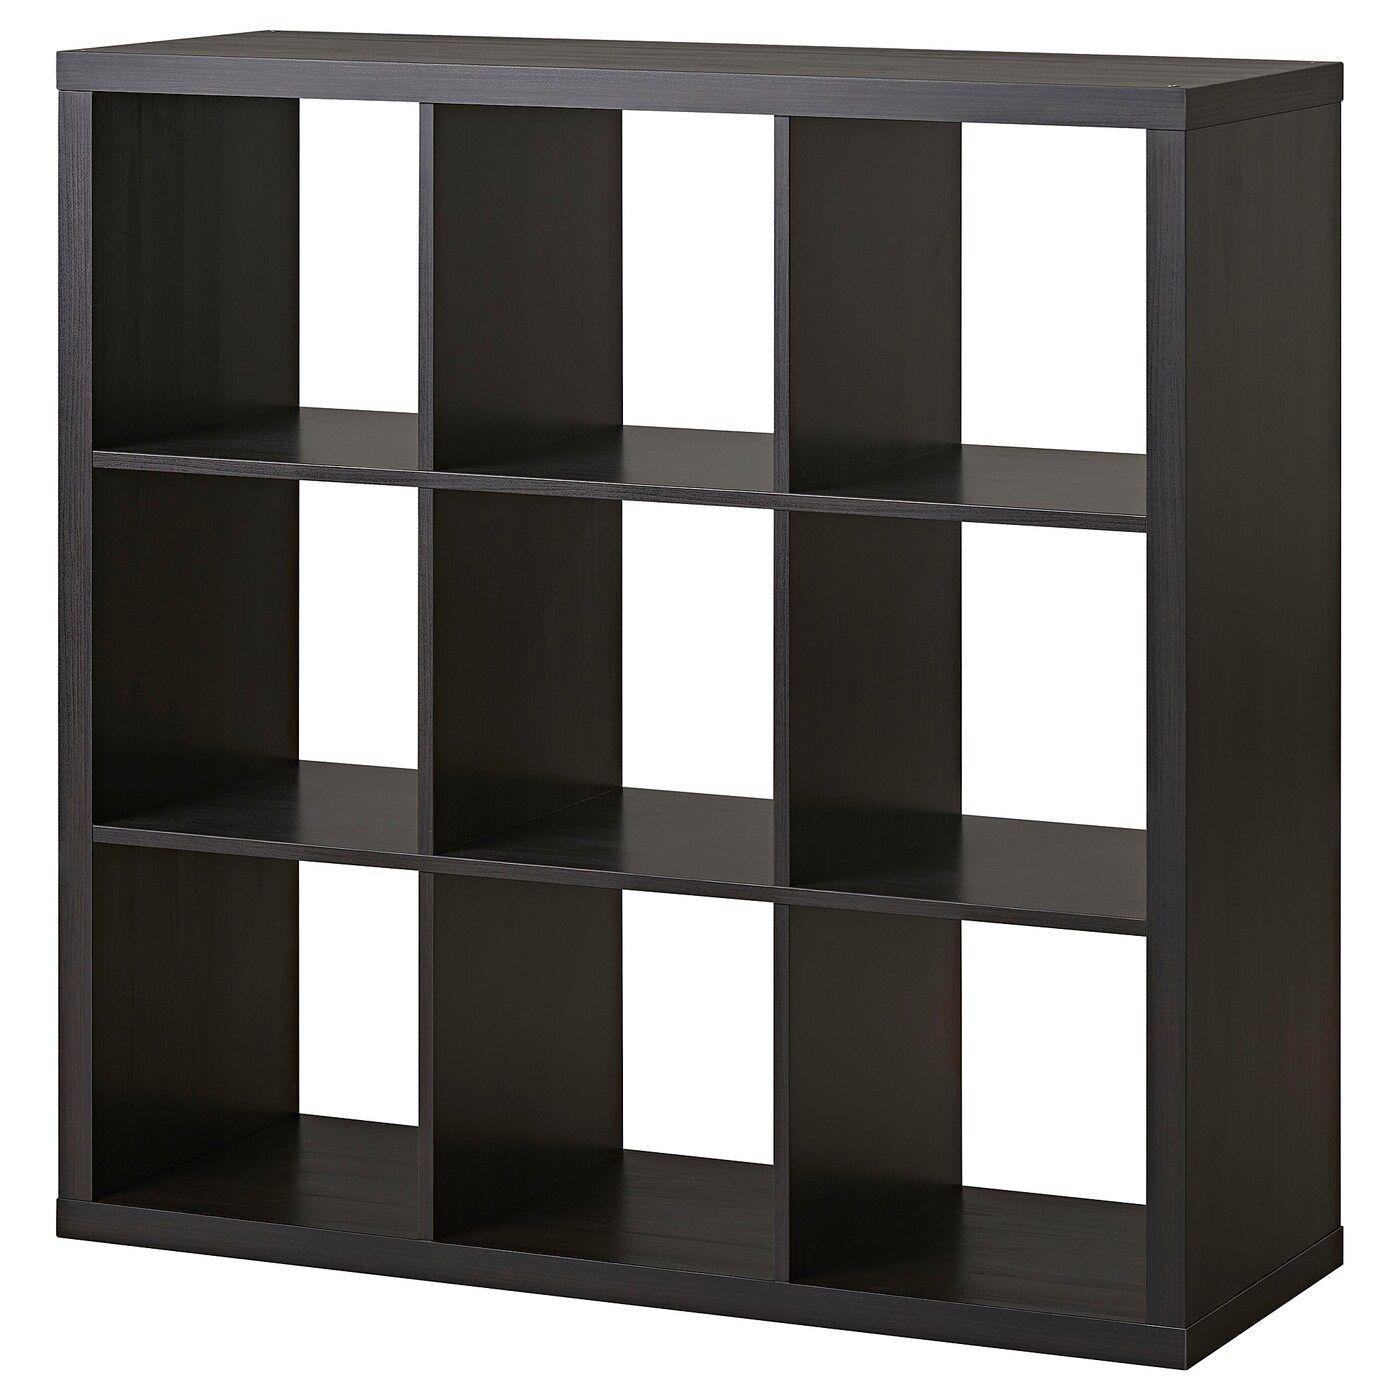 Ikea Kallax Black Brown Shelf Unit In 2020 Ikea Kallax Shelf